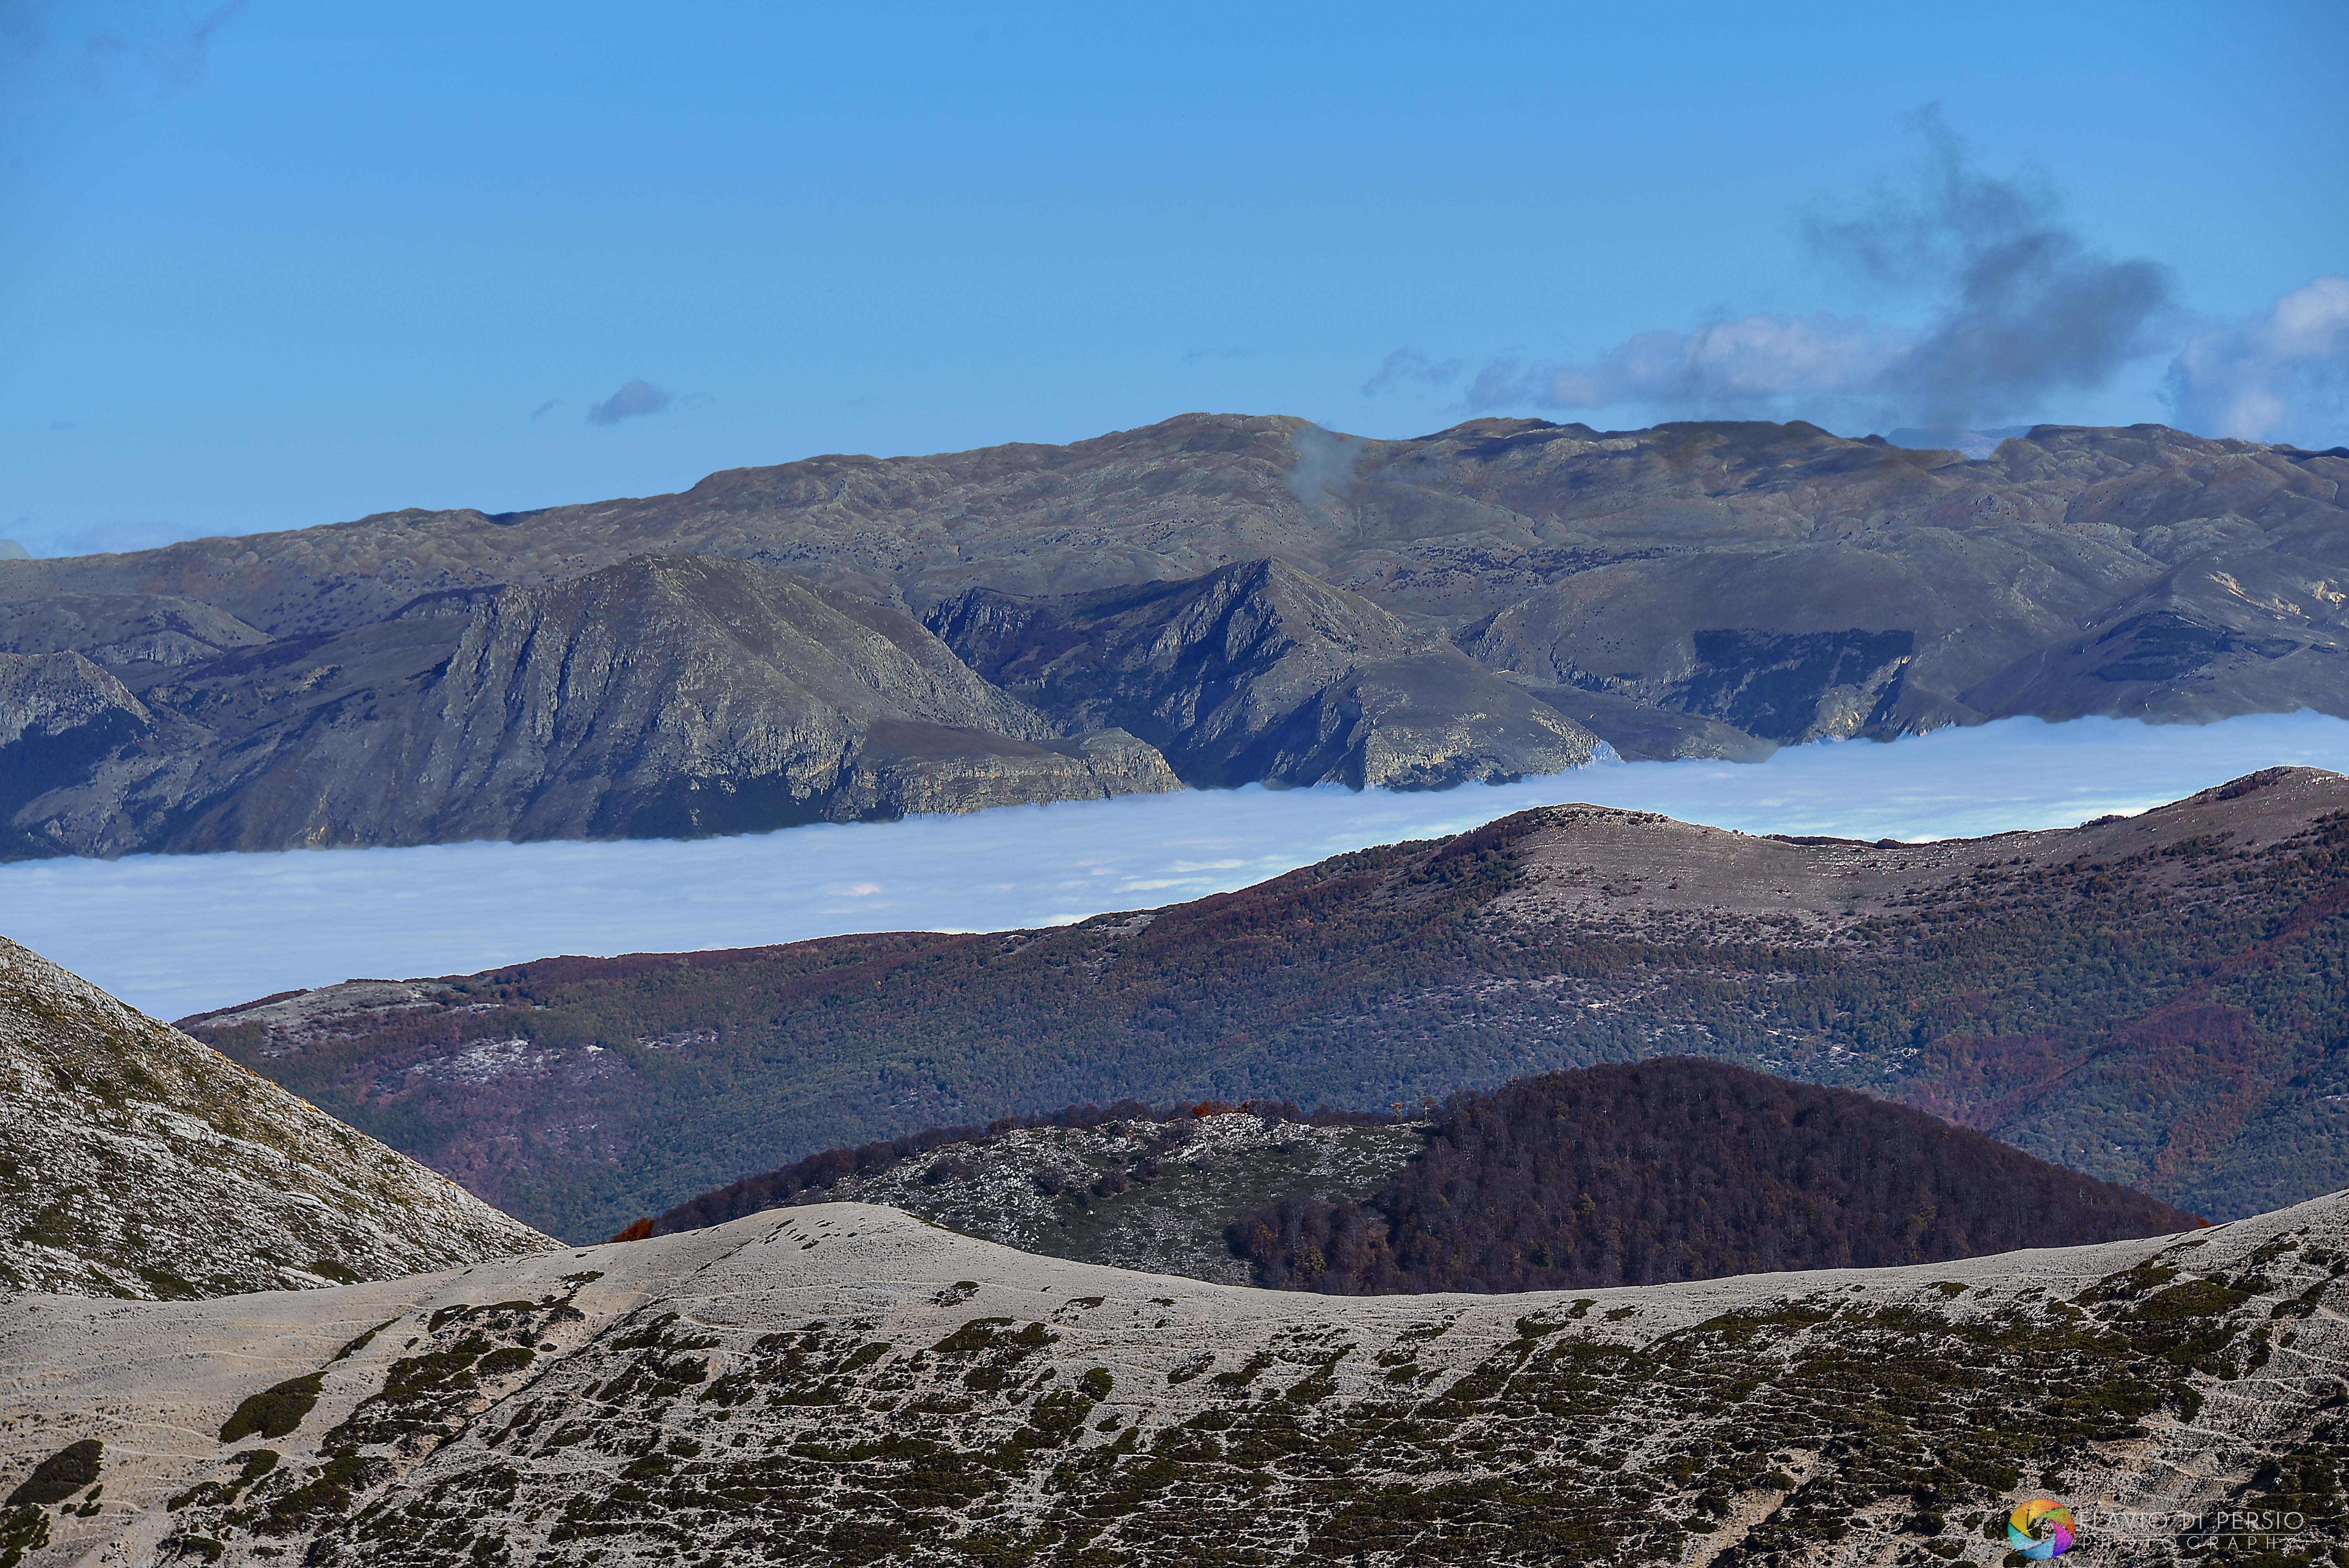 Monti Ernici